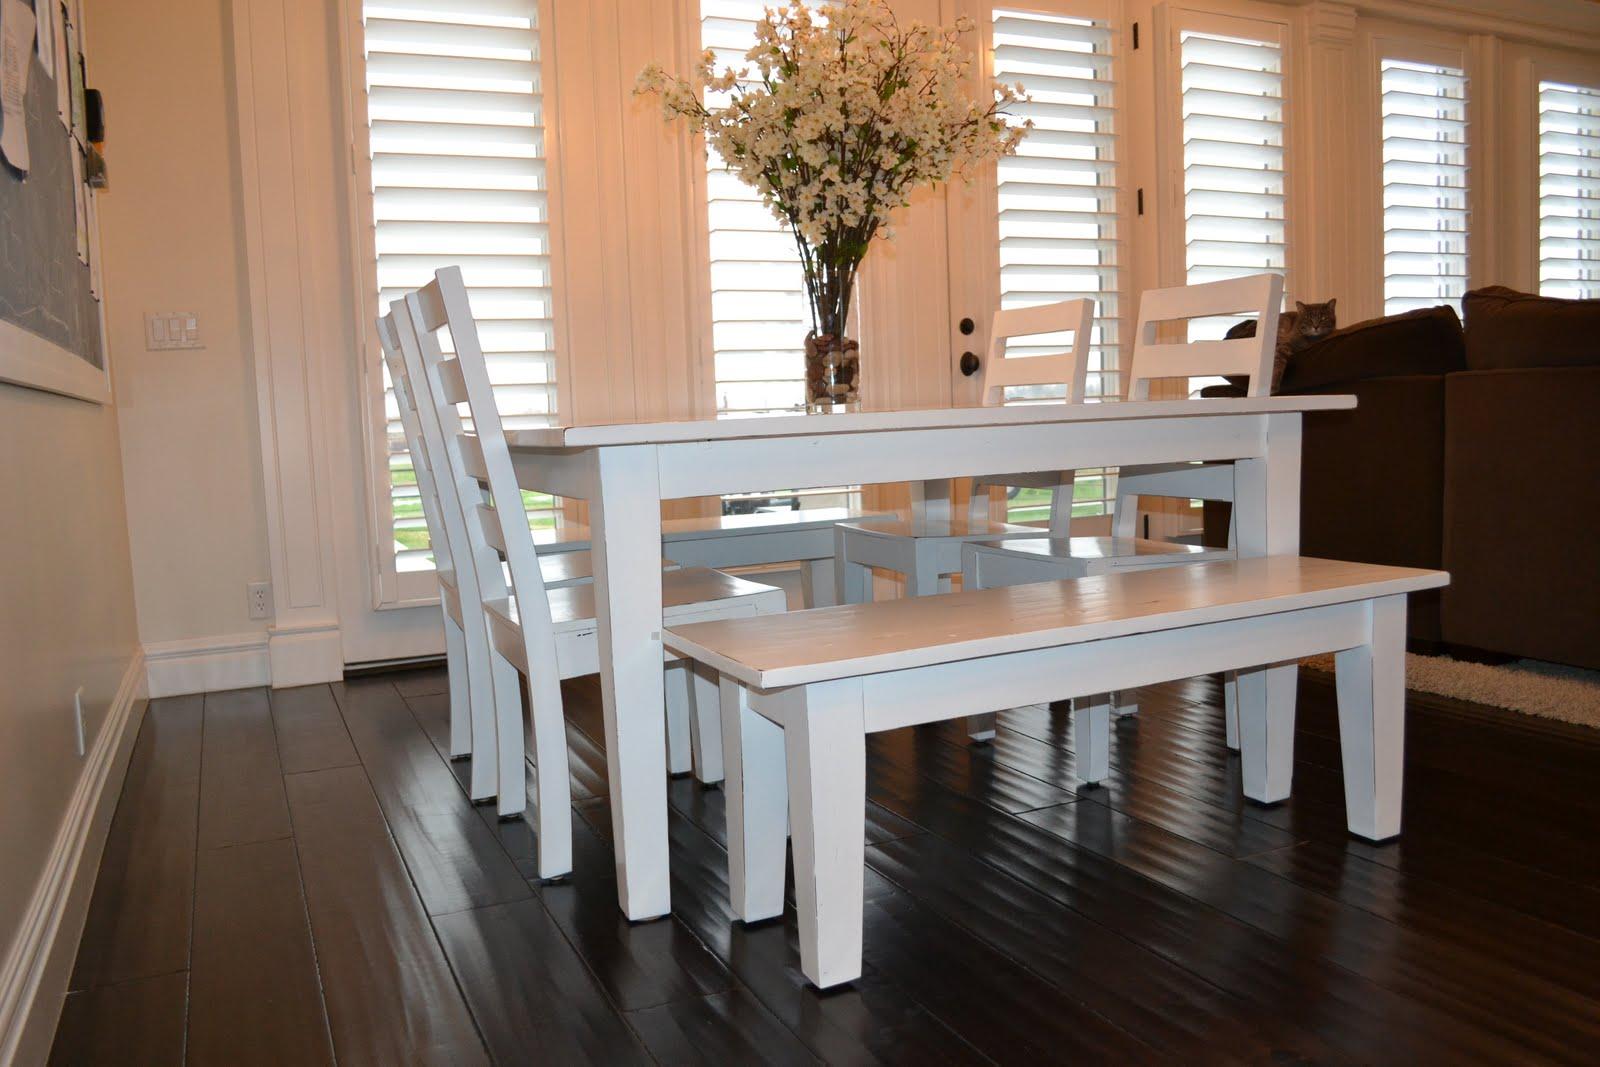 white+distressed+kitchen+table white distressed kitchen table White Distressed Kitchen Table White of The Kitchen Table